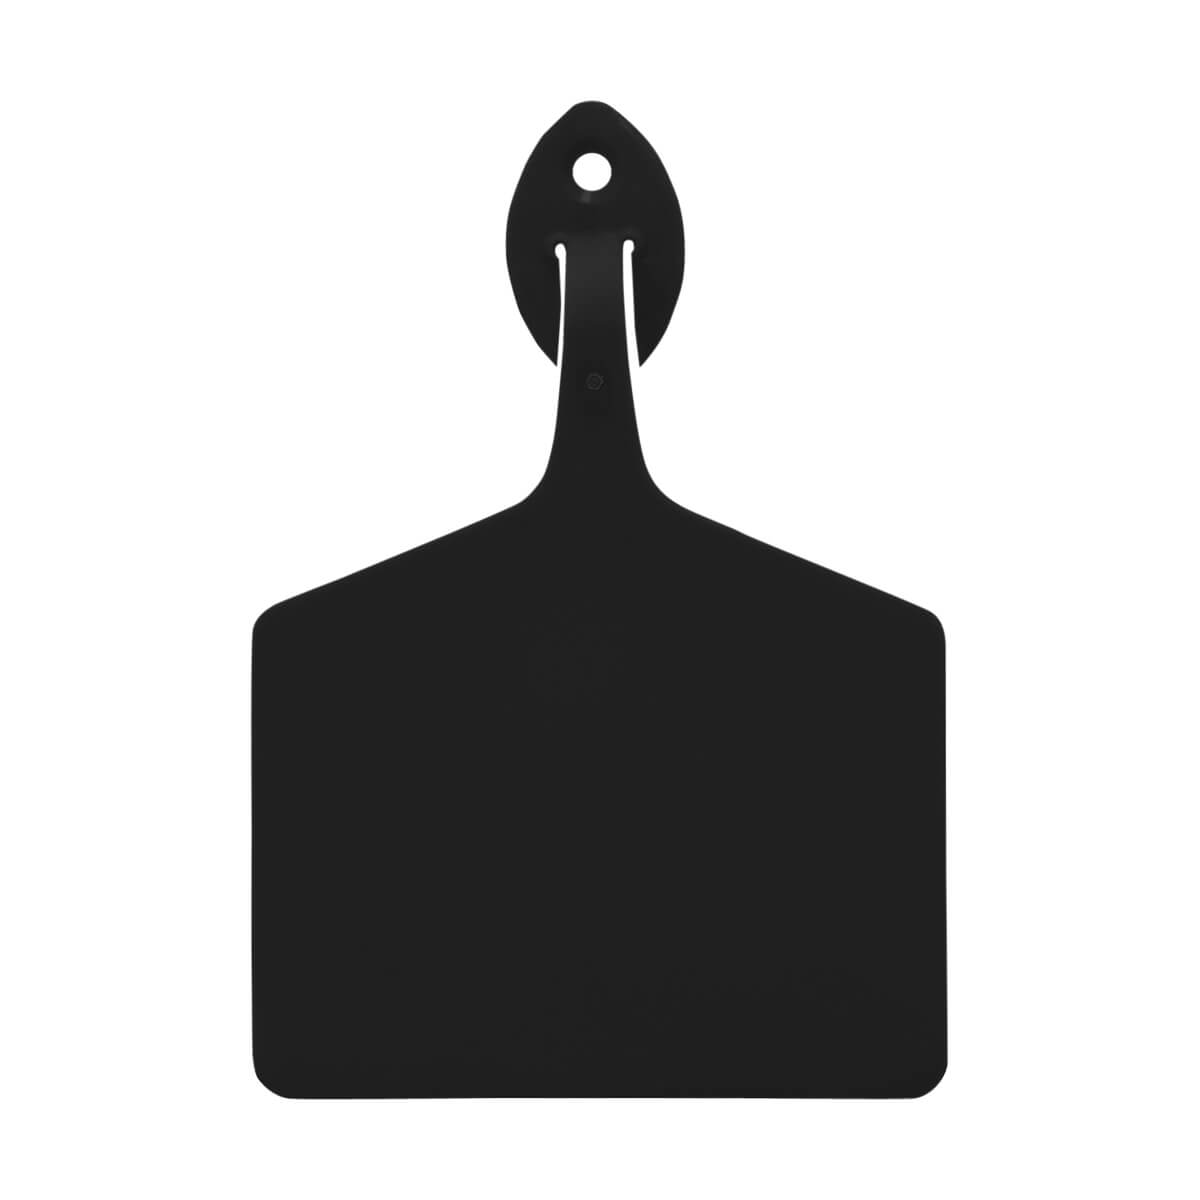 Allflex One-Piece Feedlot Tags - Black